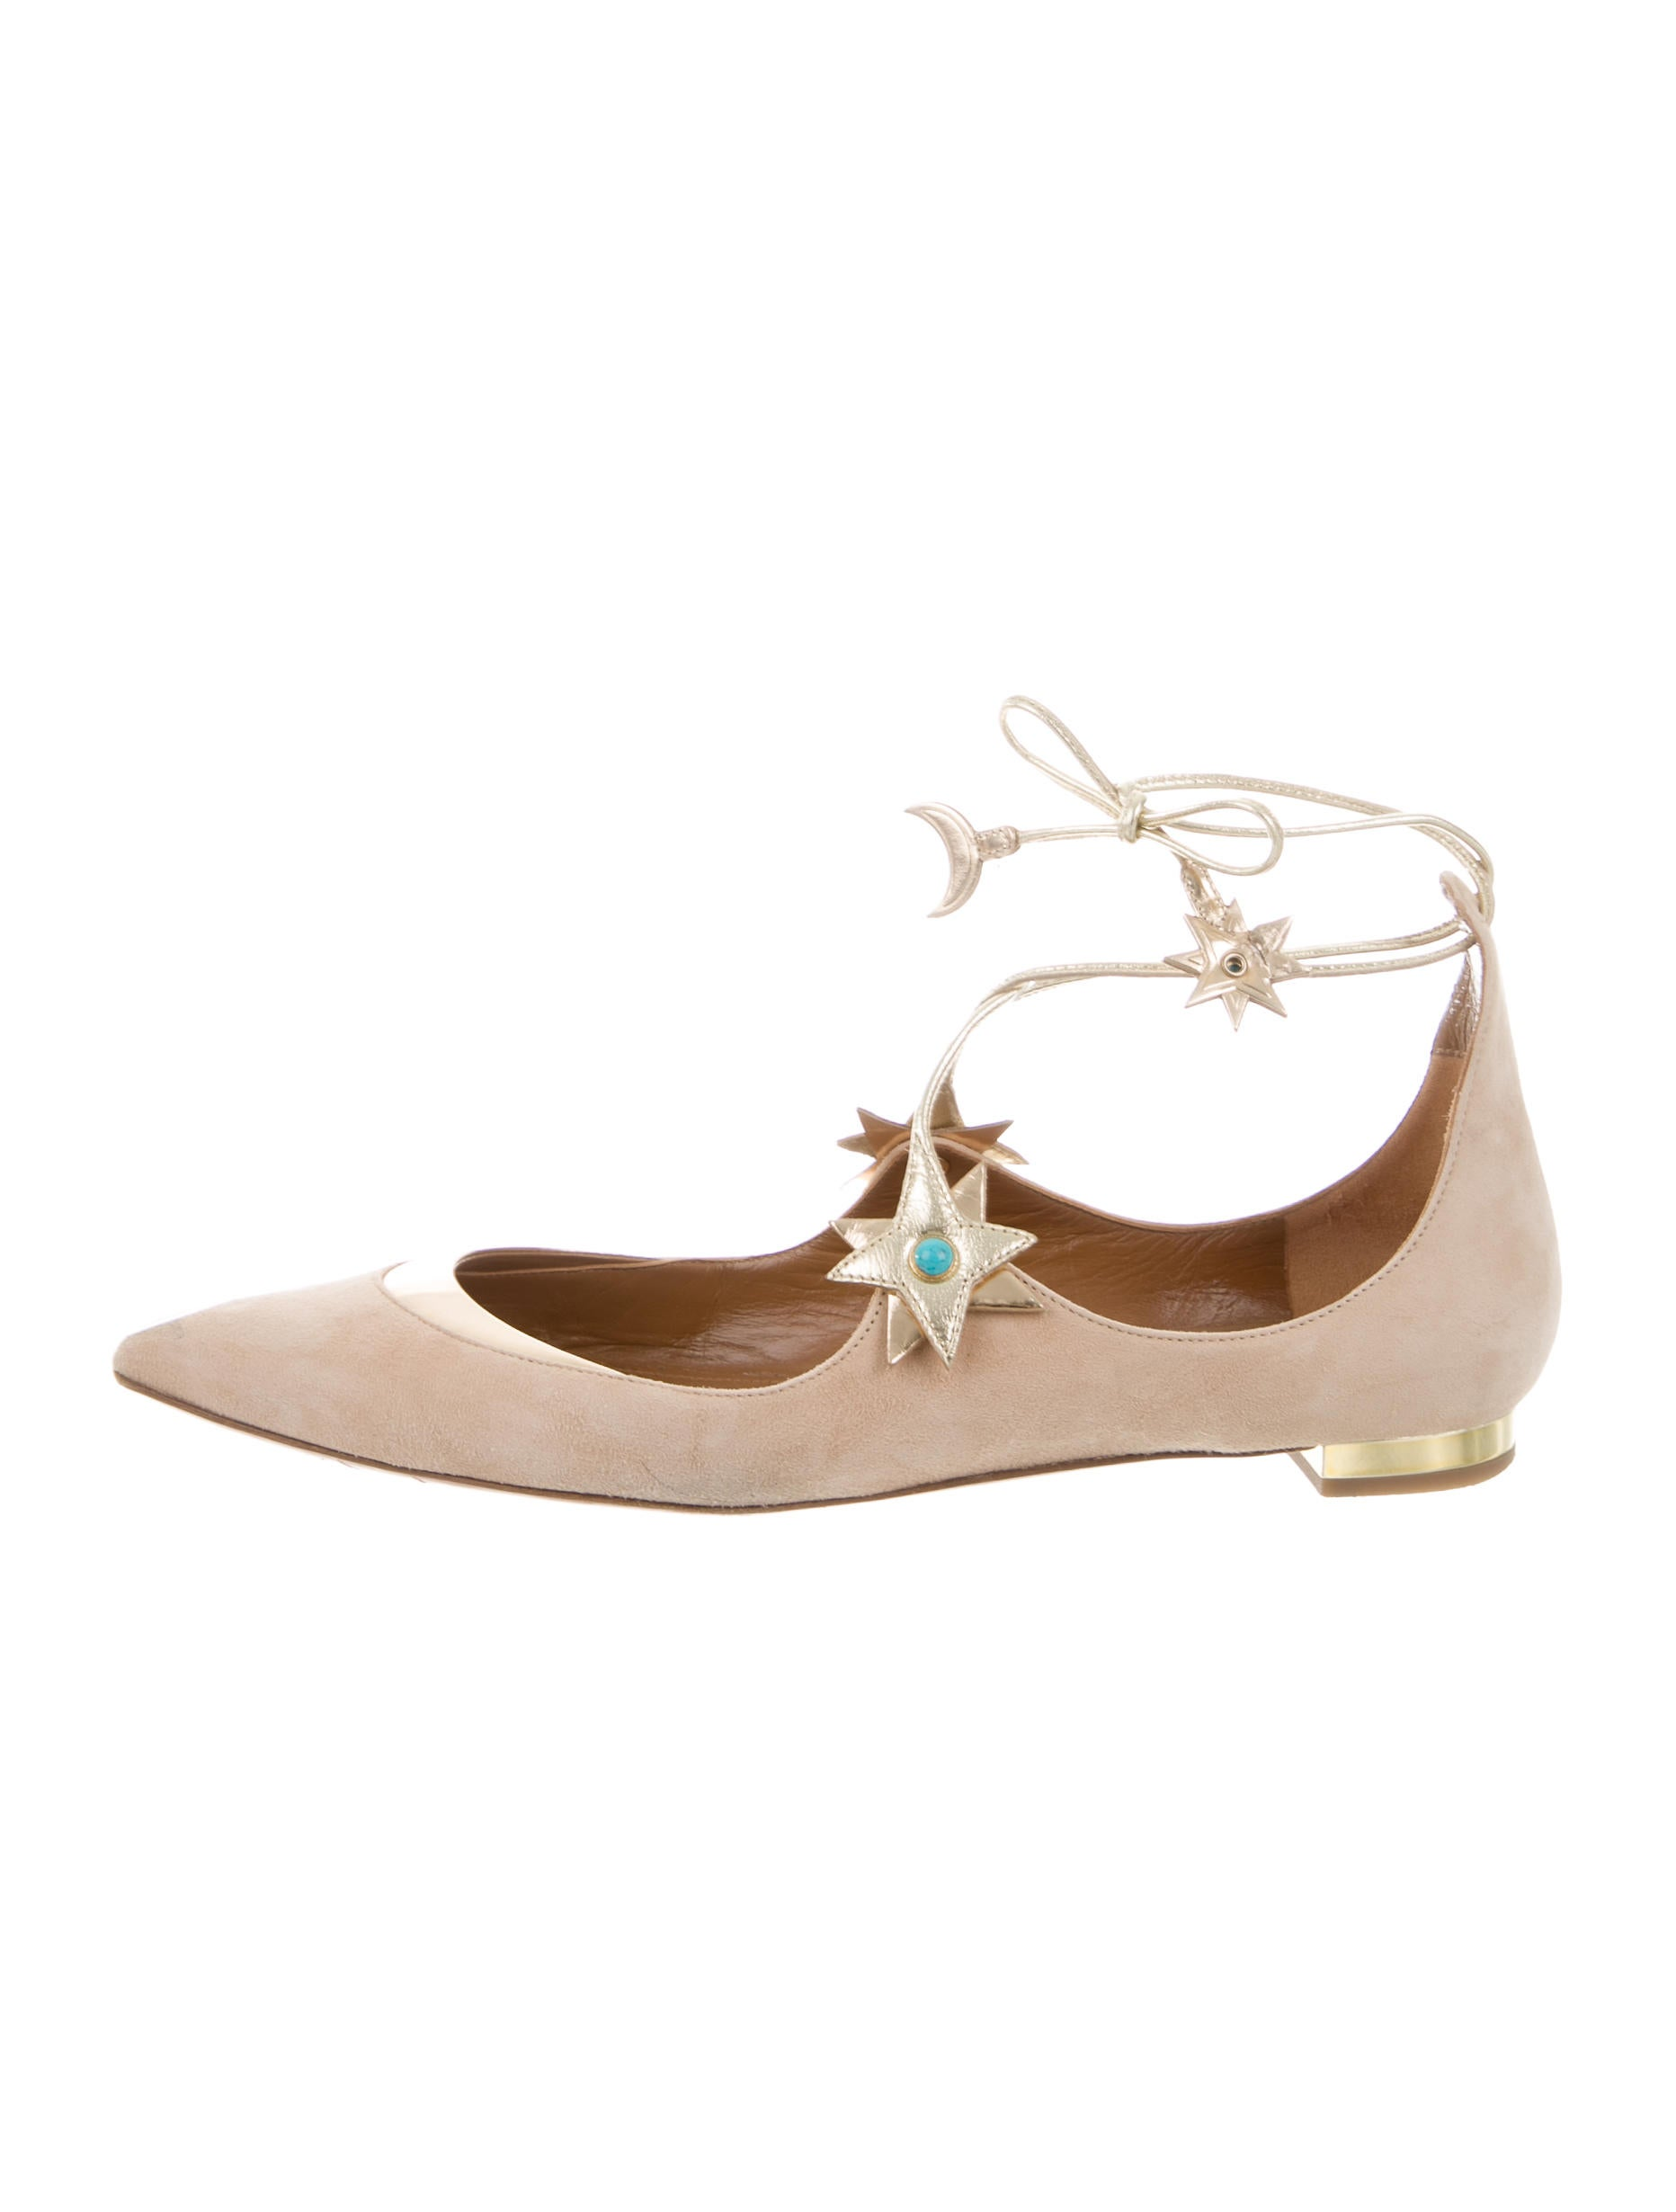 Poppy Delevingne and Aquazzura Team Up to Design Shoes advise